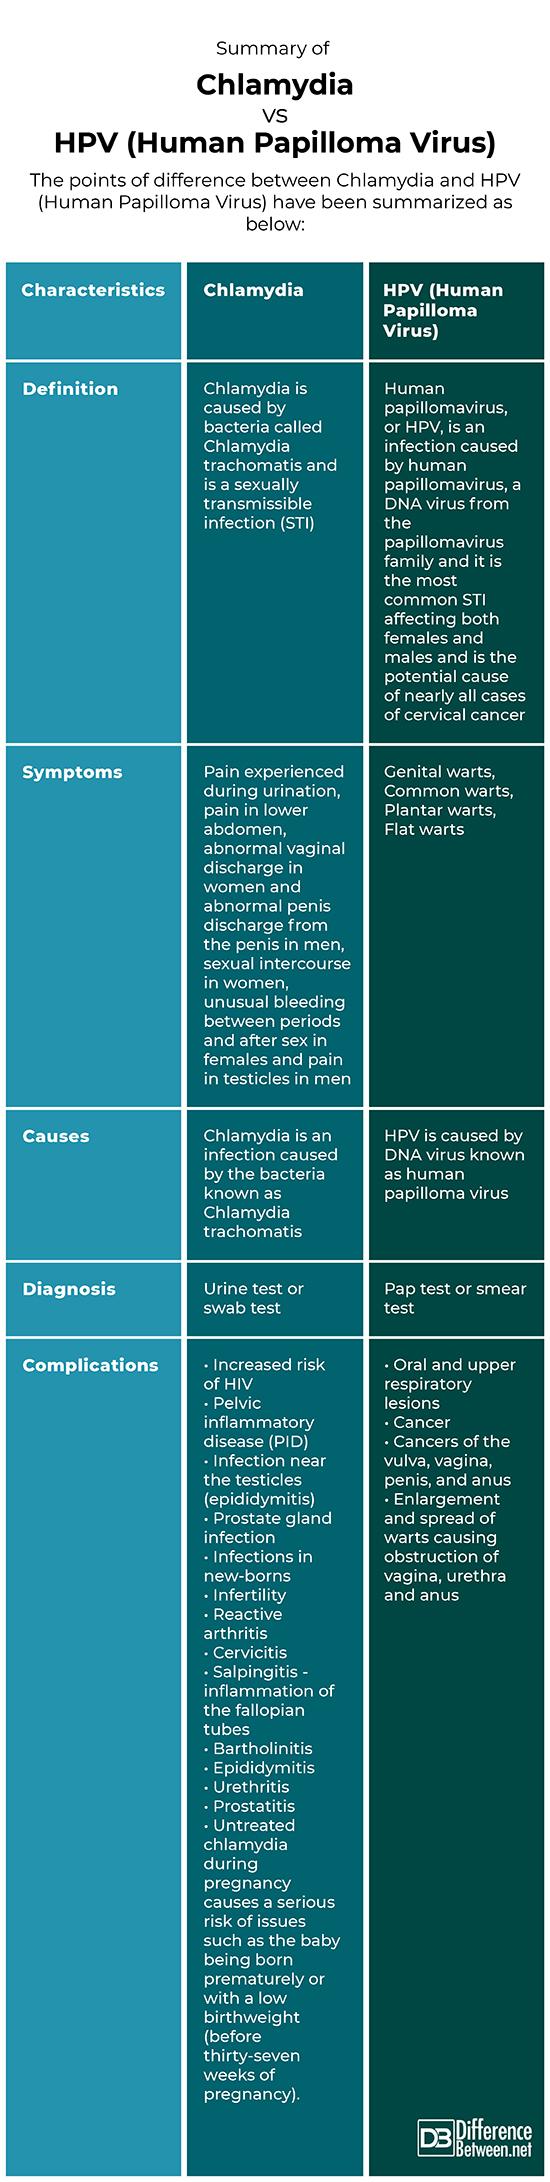 human papillomavirus and yeast infections)